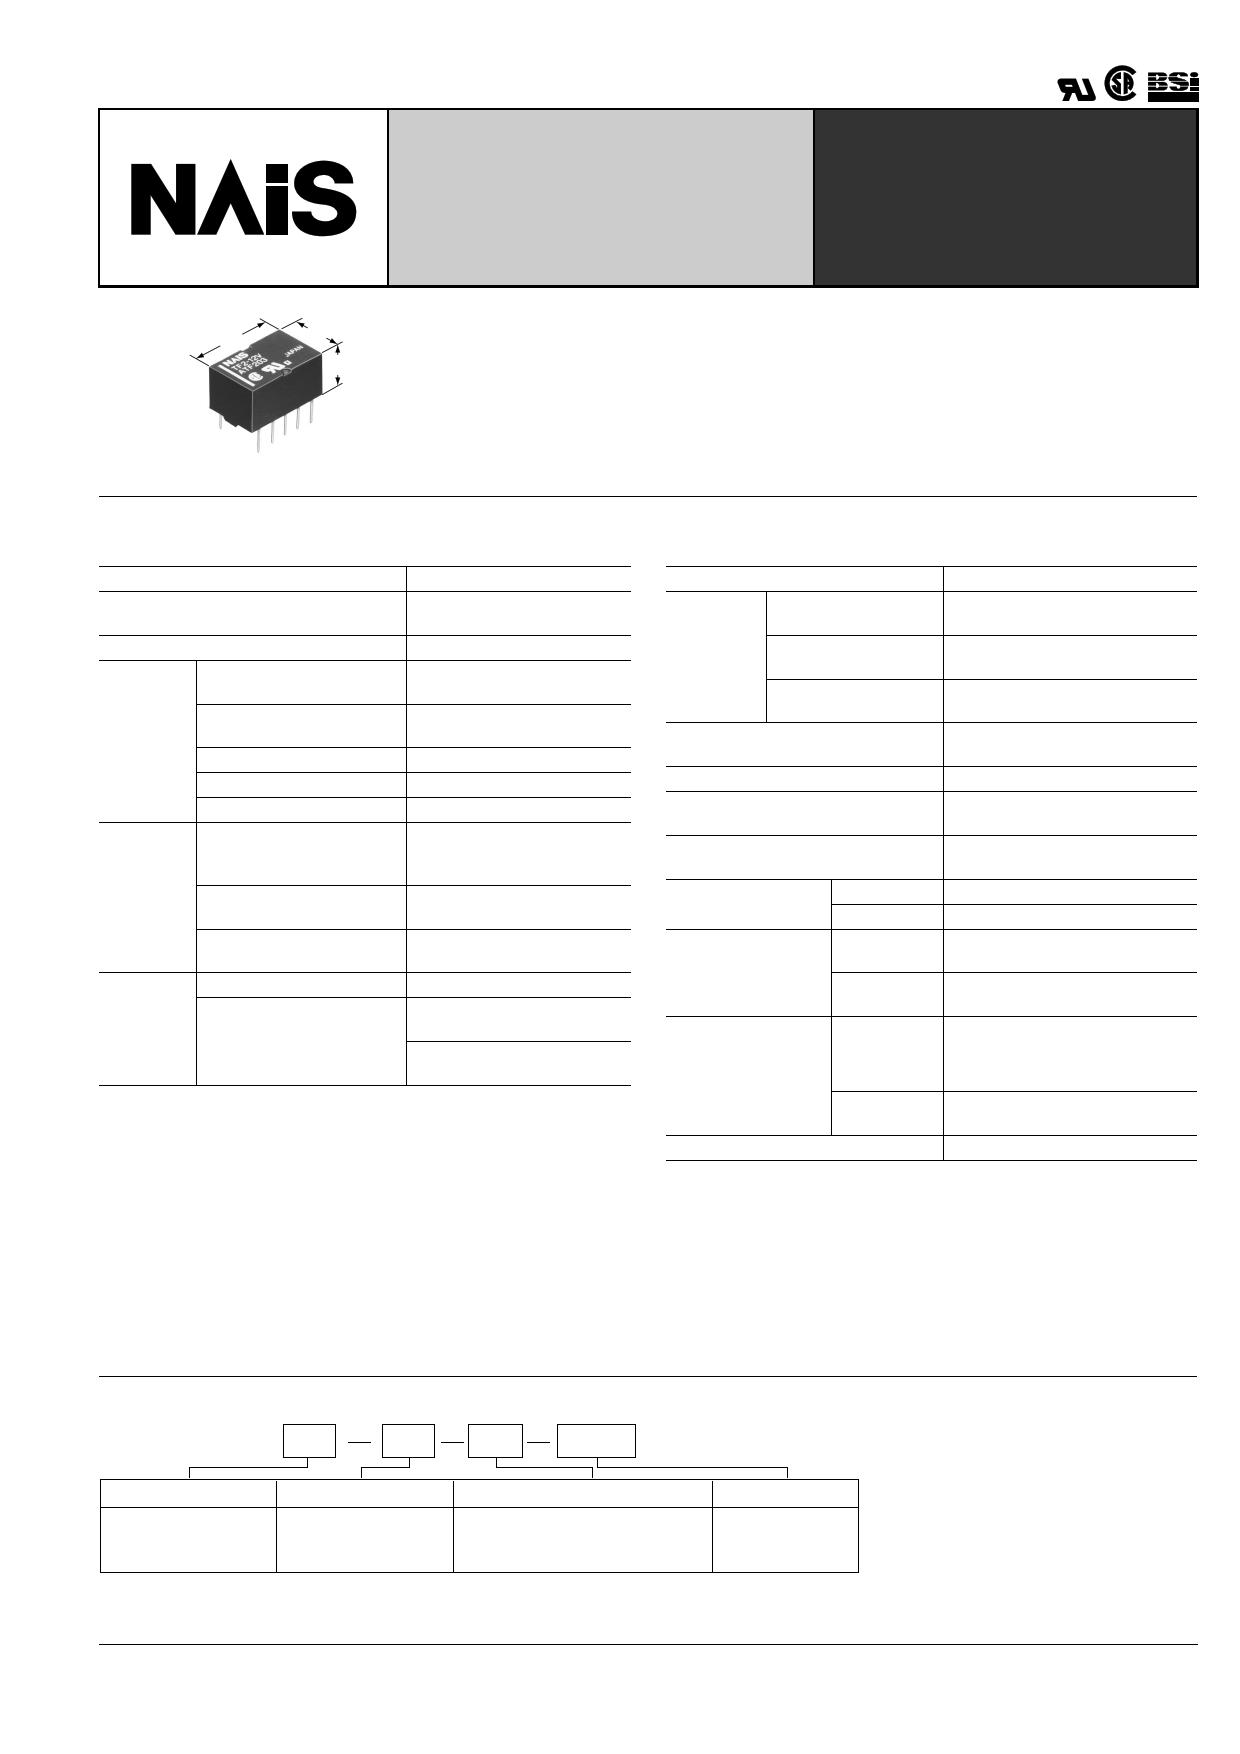 TF2-L2-H-6V datasheet